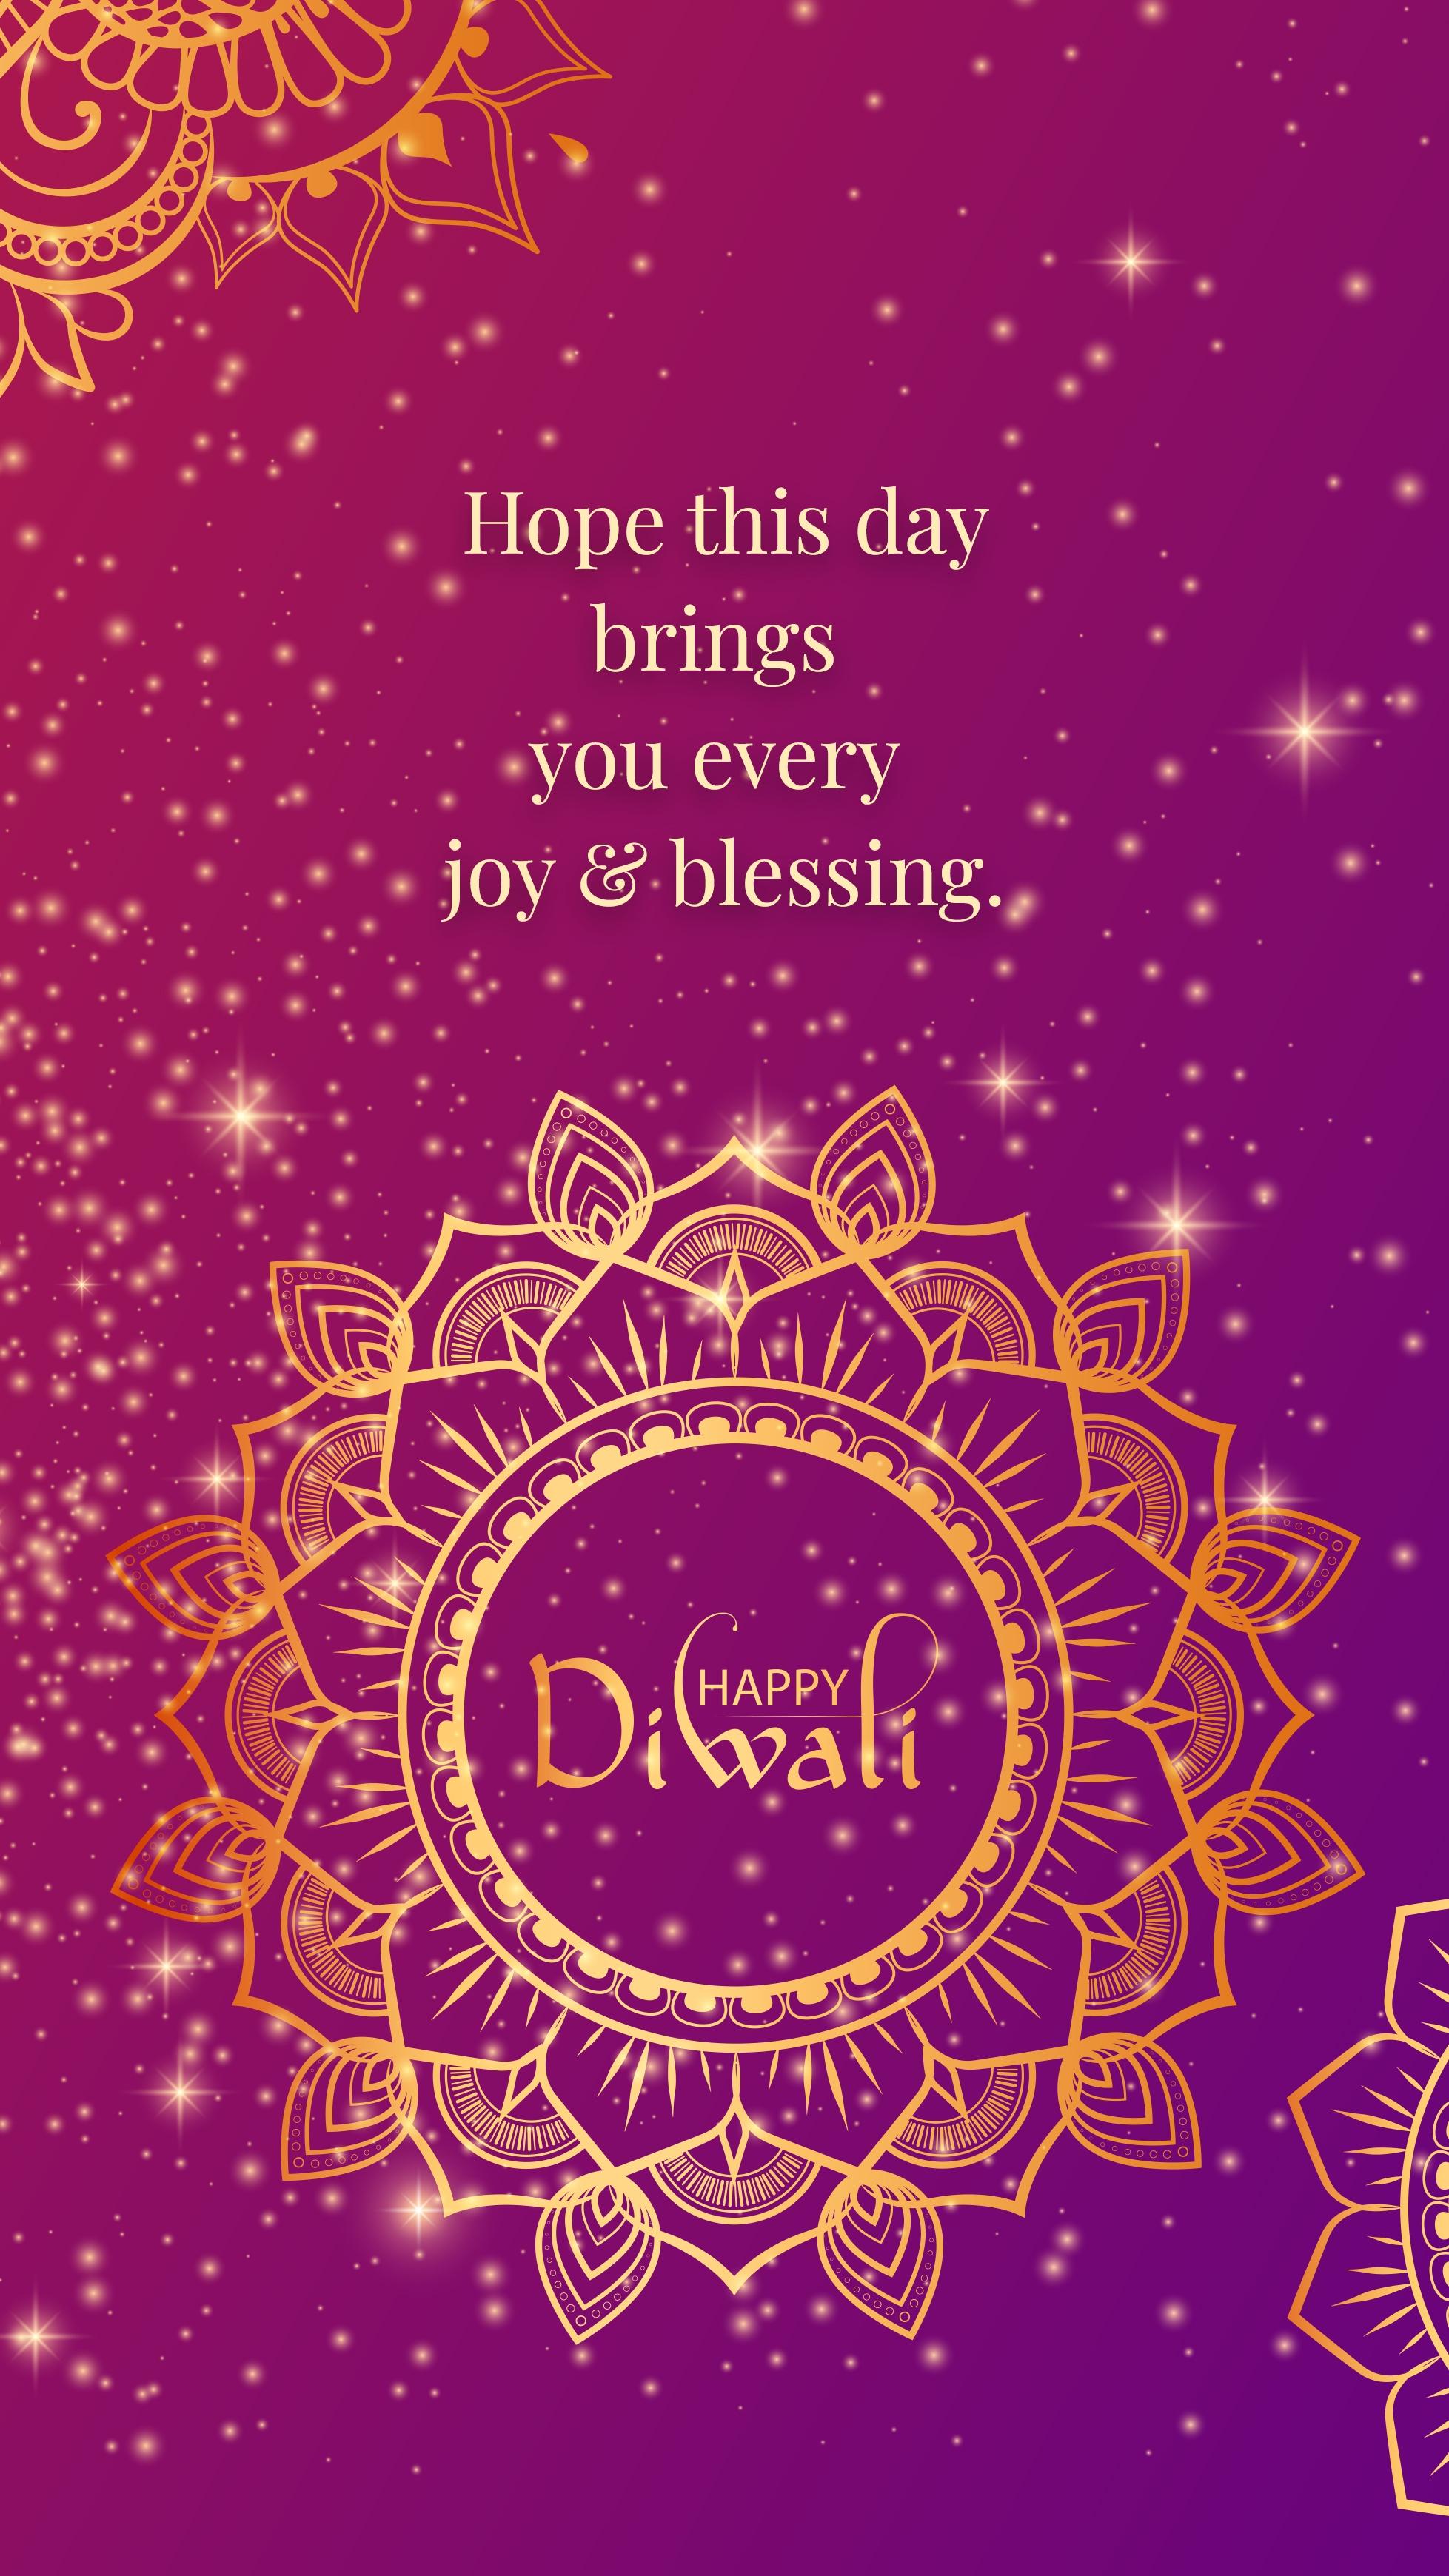 Happy Diwali 2